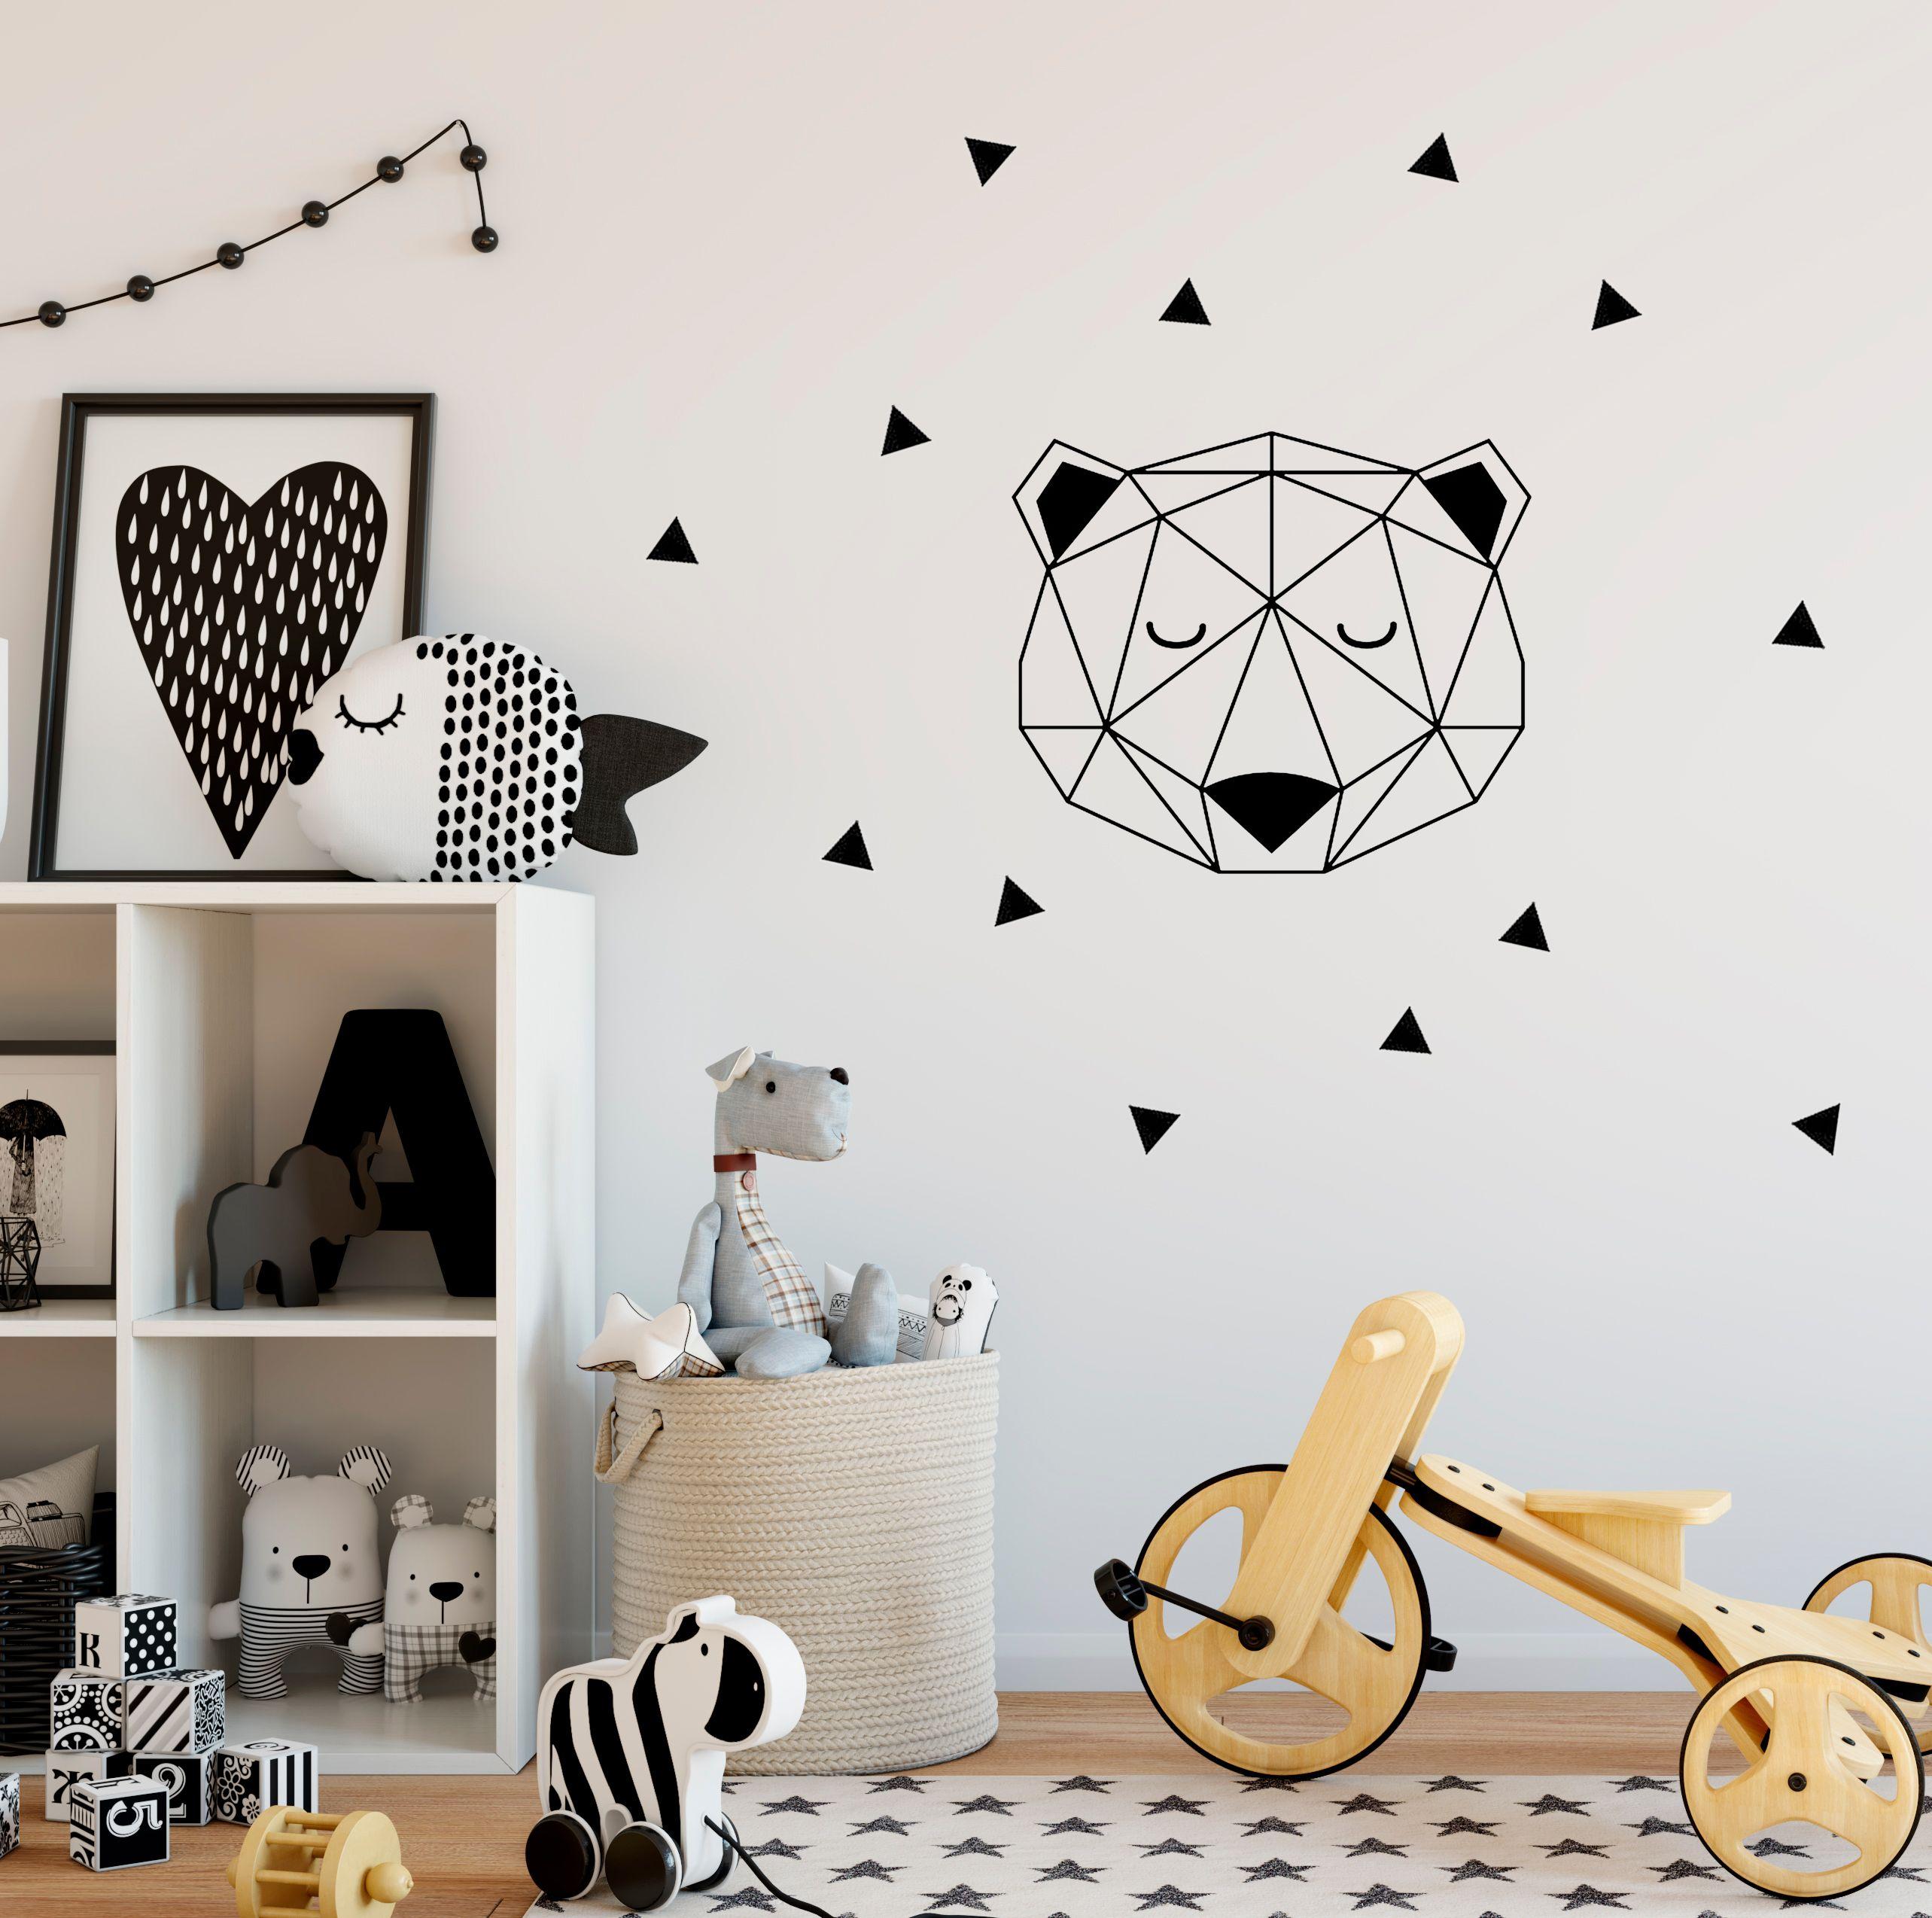 Vinilo-pared-cabeza-oso-geométrica